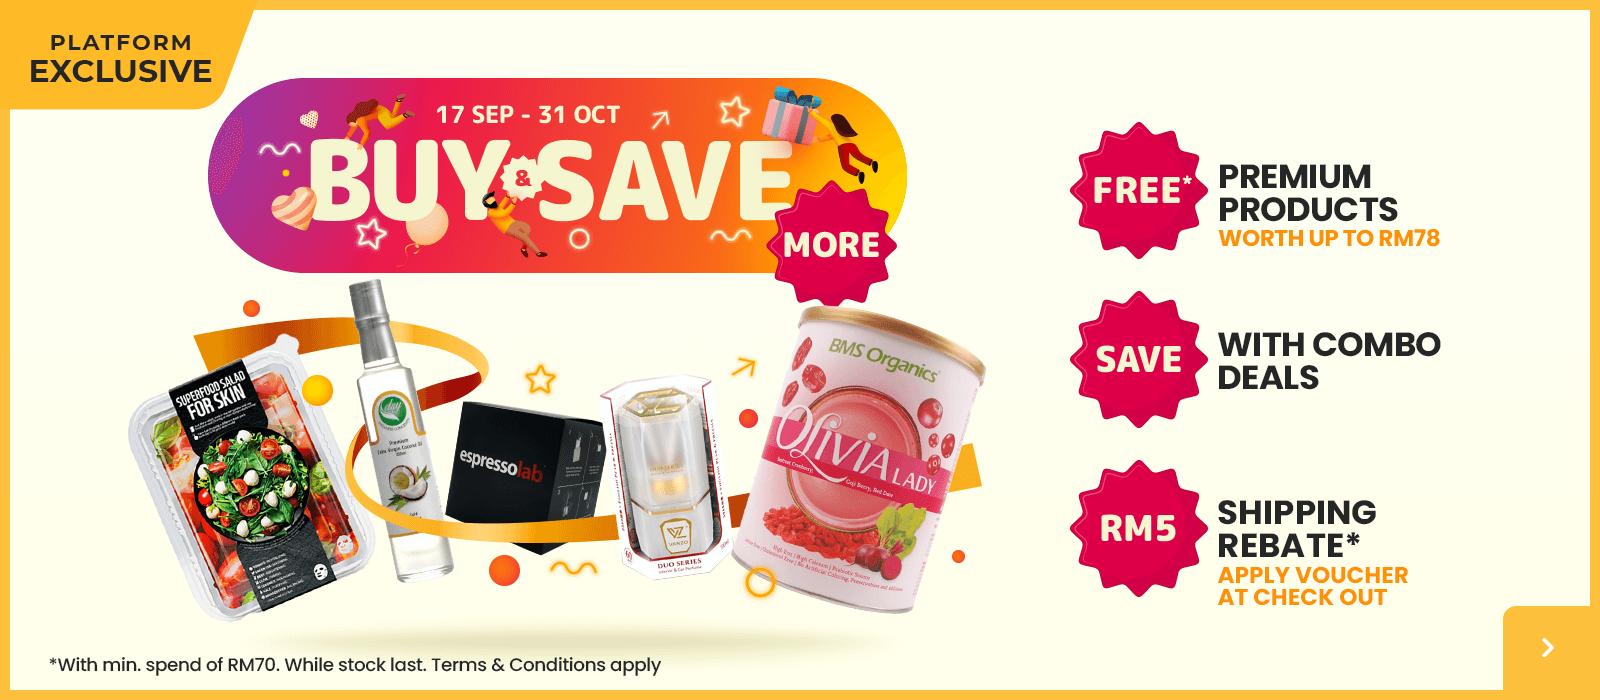 Buy & Save